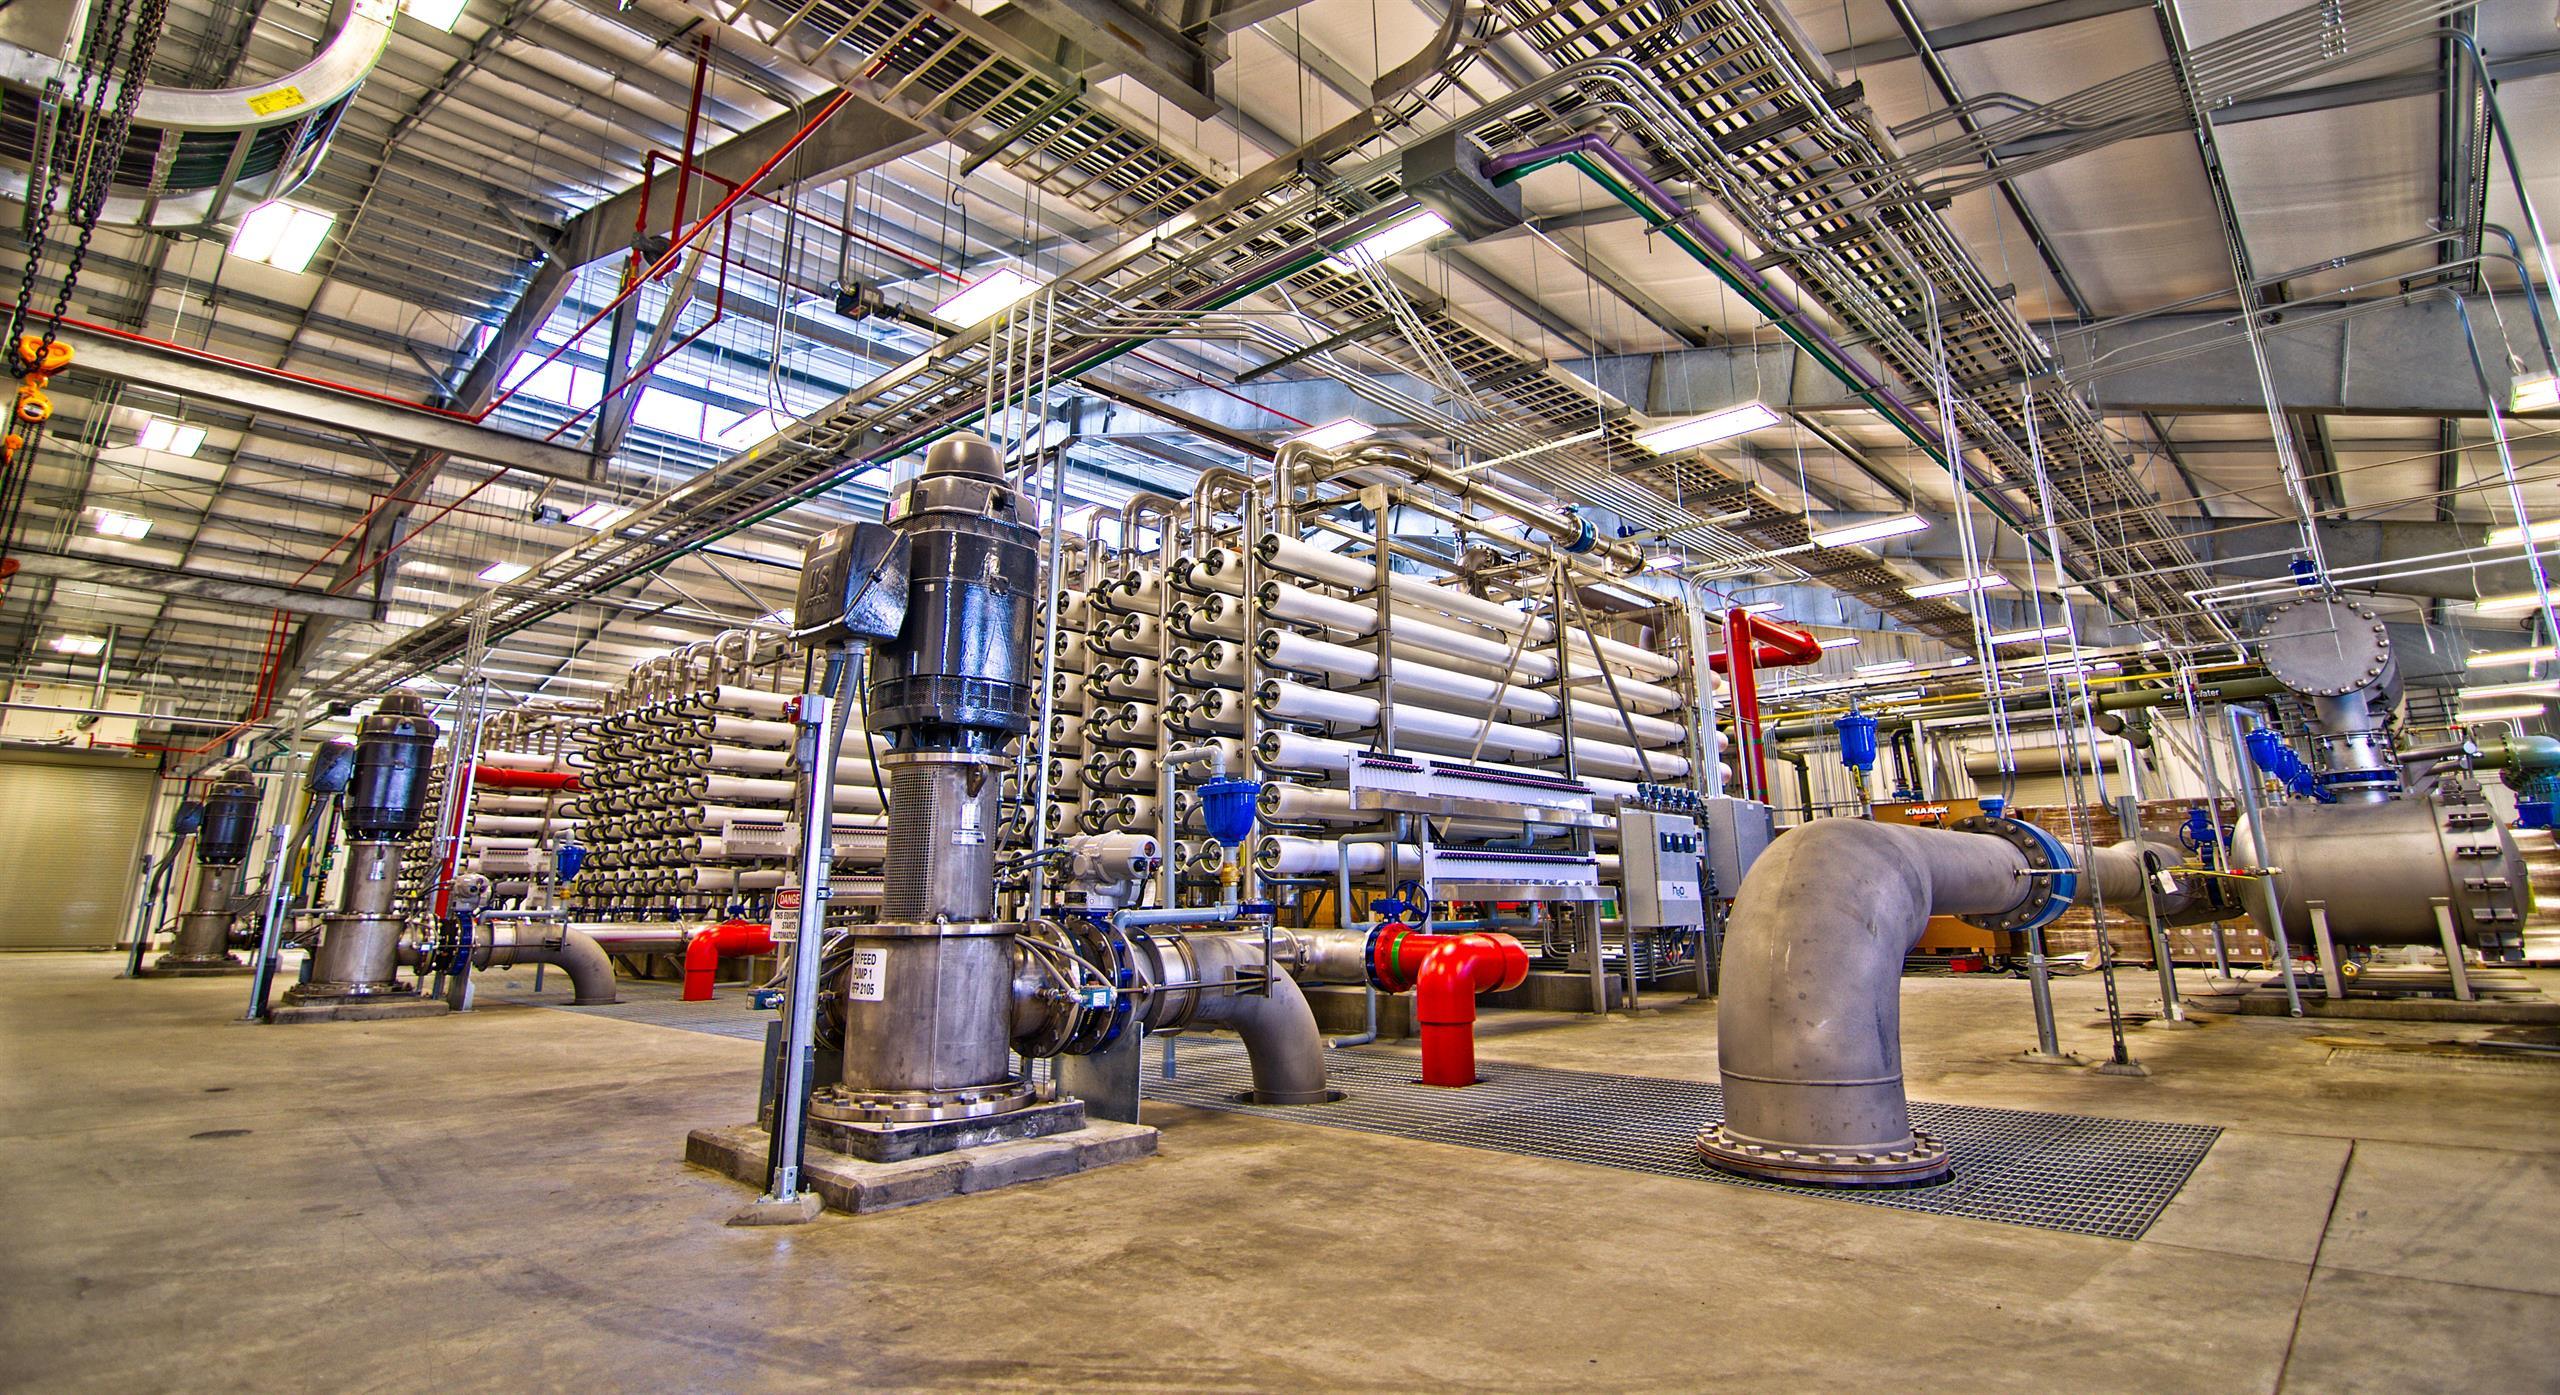 Reverse osmosis water treatment plant, USA - Mott MacDonald